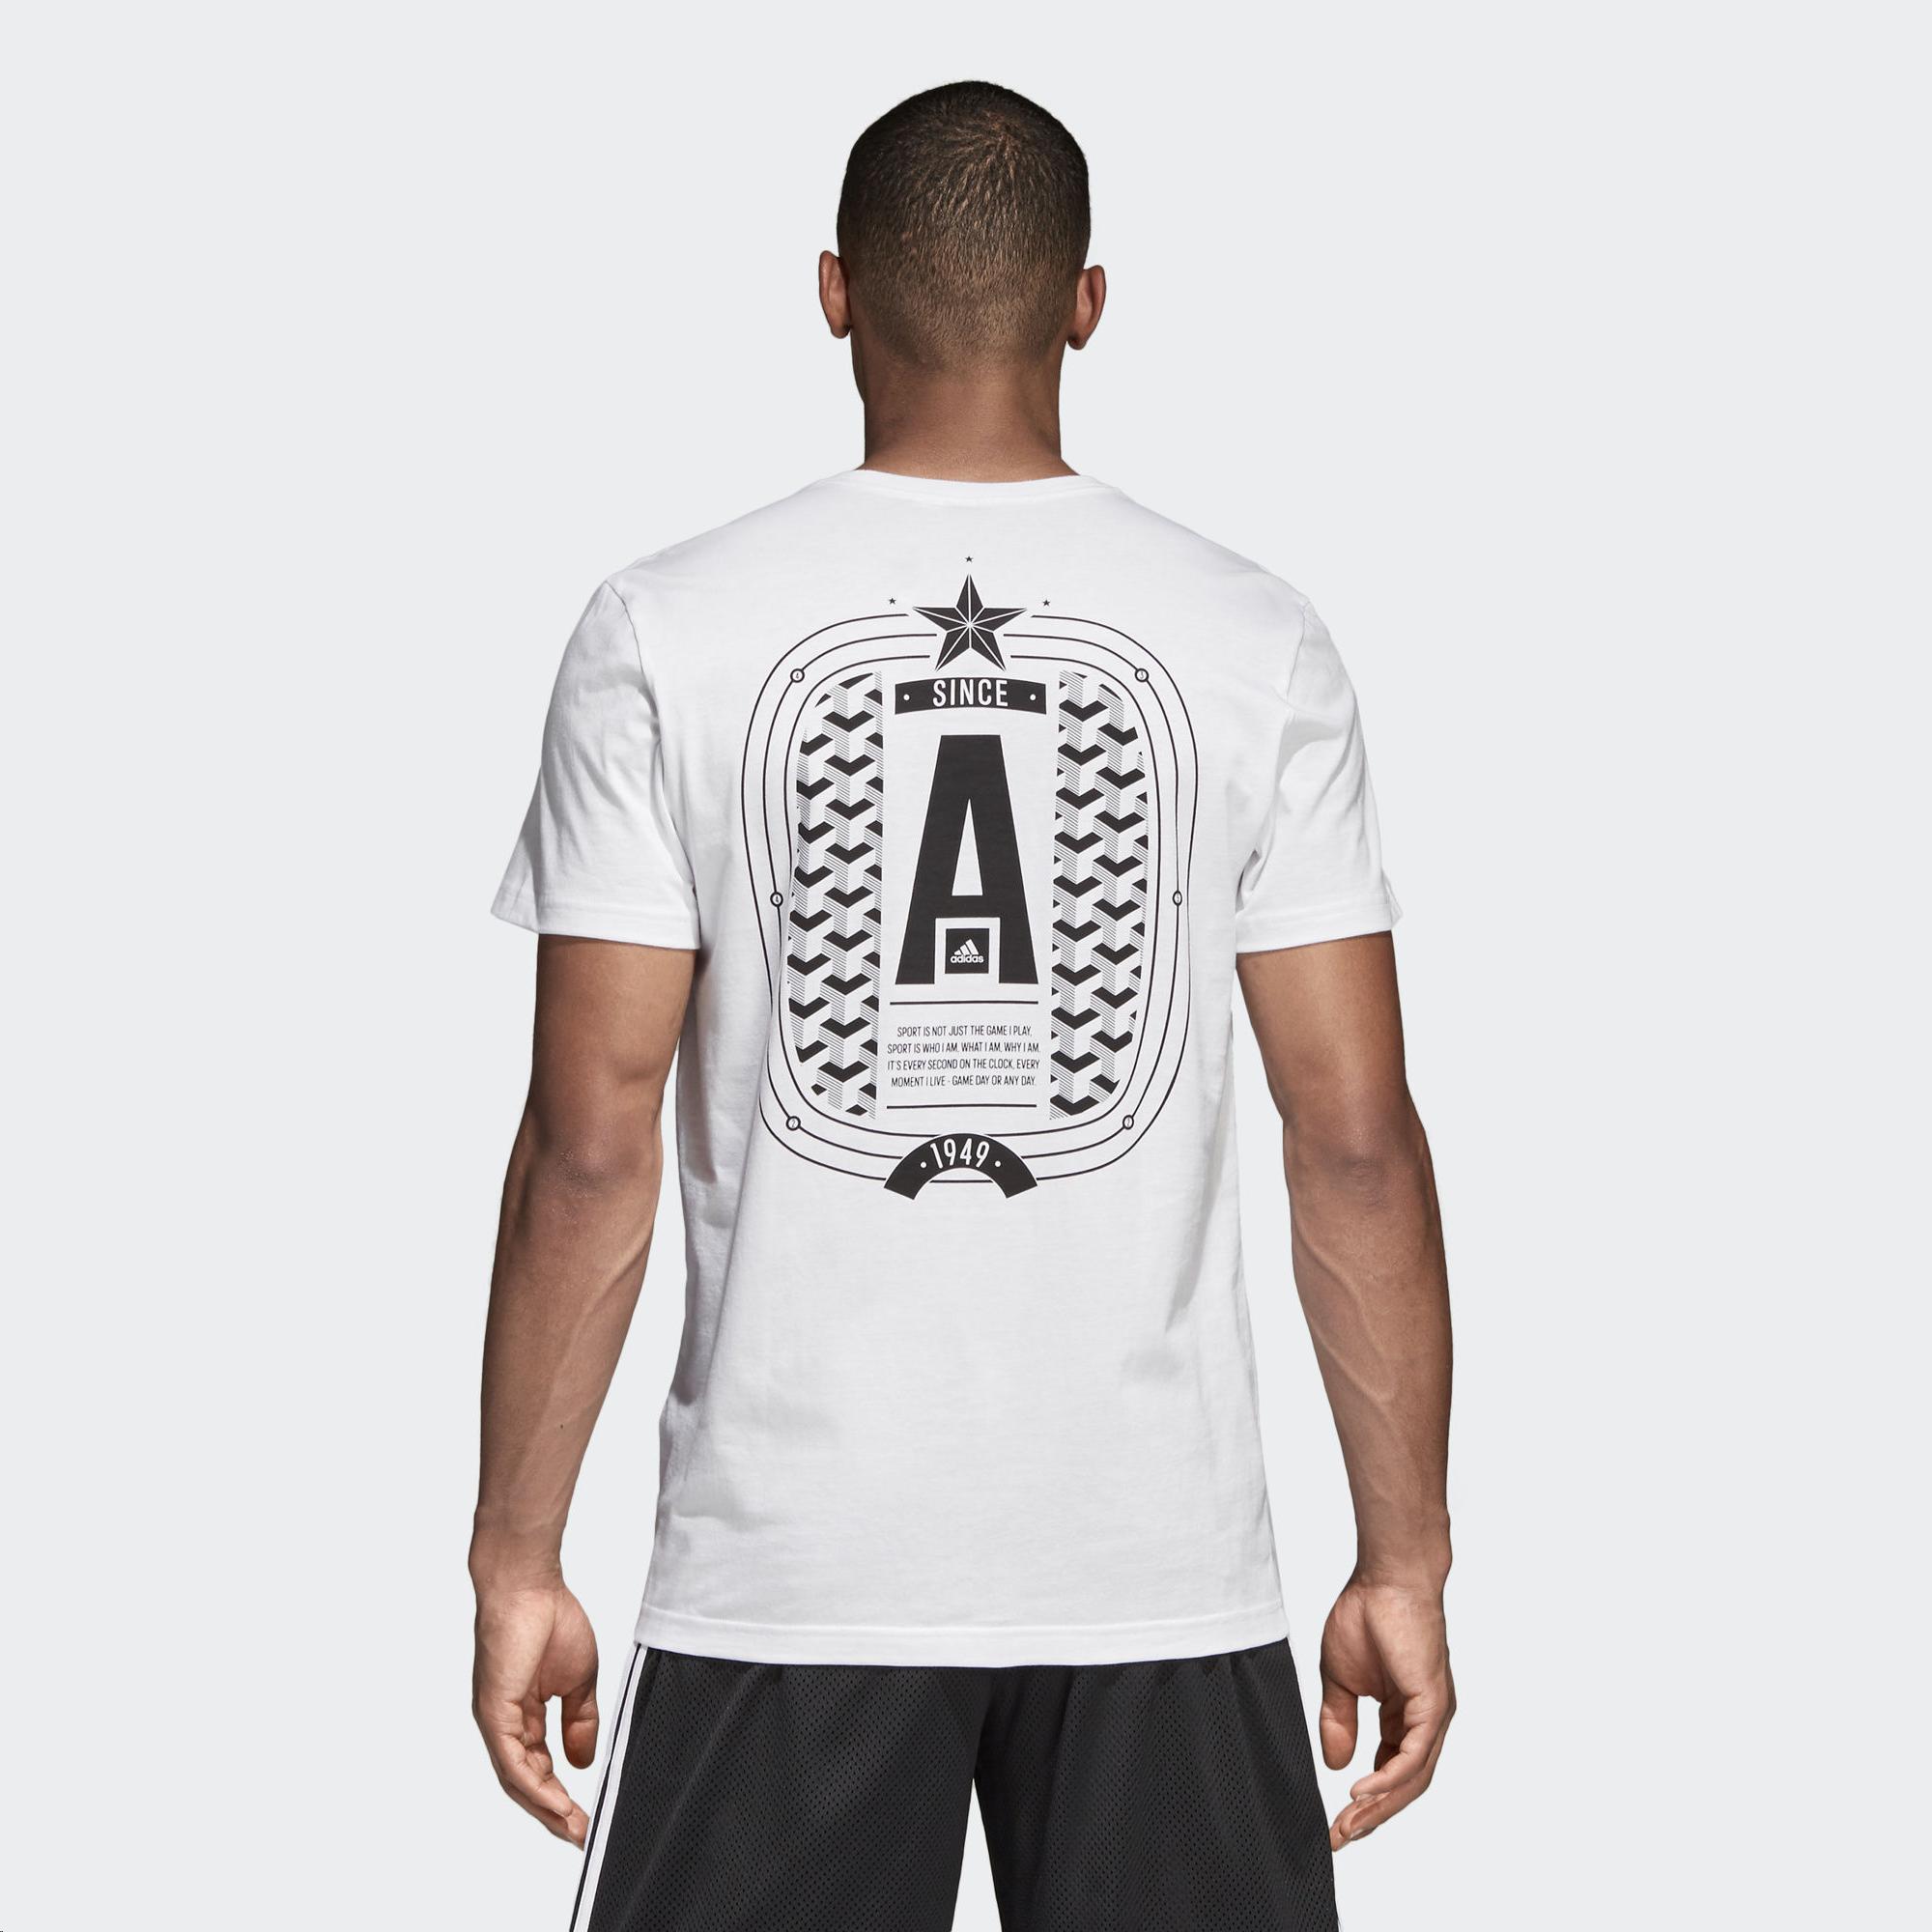 separation shoes 70286 9132d Camiseta Adidas Stadium Tee Blanco Hombre - Deportes Moya